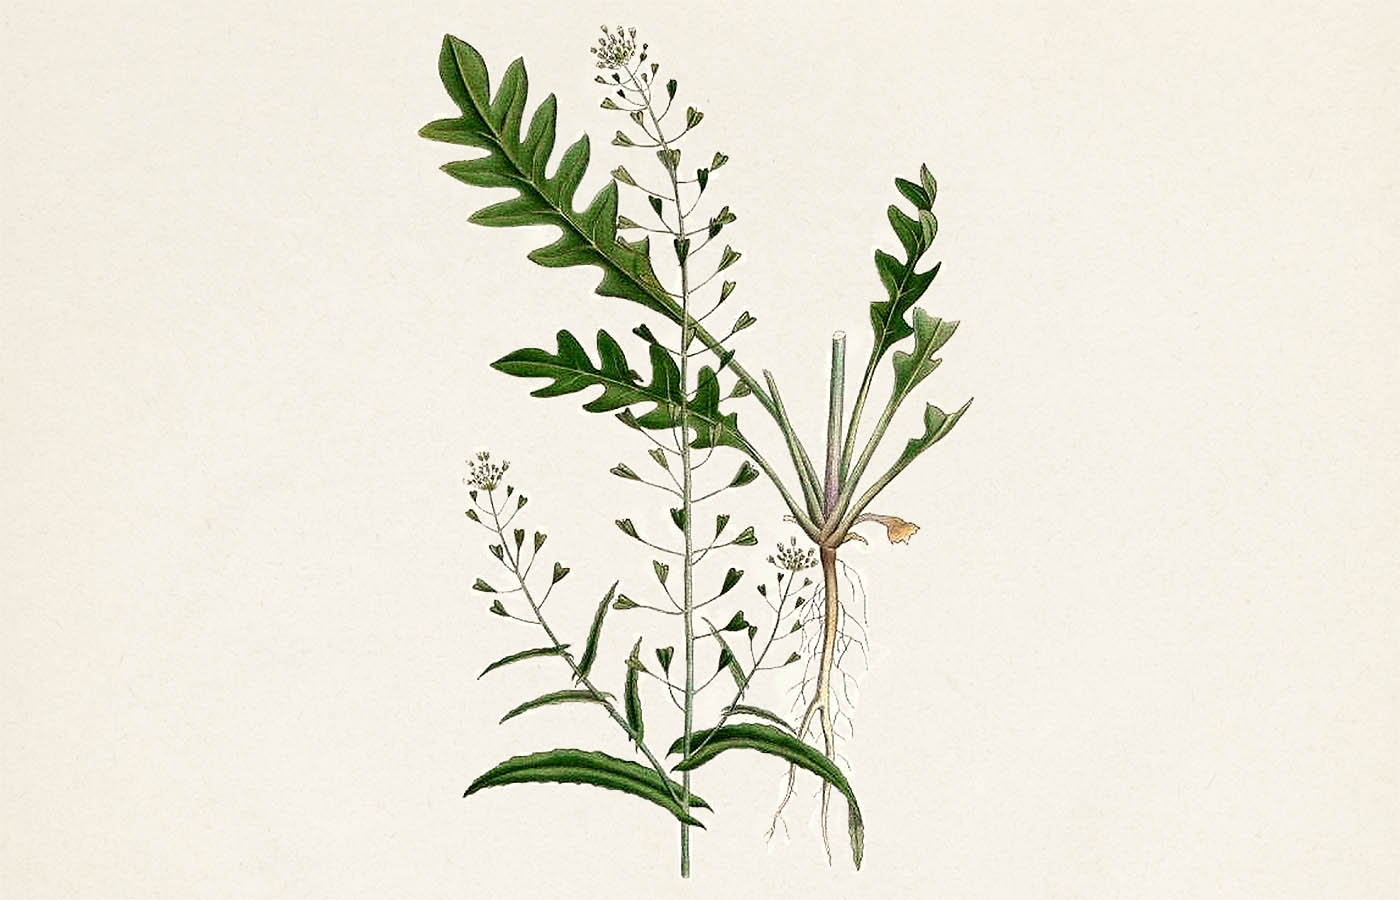 Kokoška pastuší tobolka (Capsella bursapastoris)